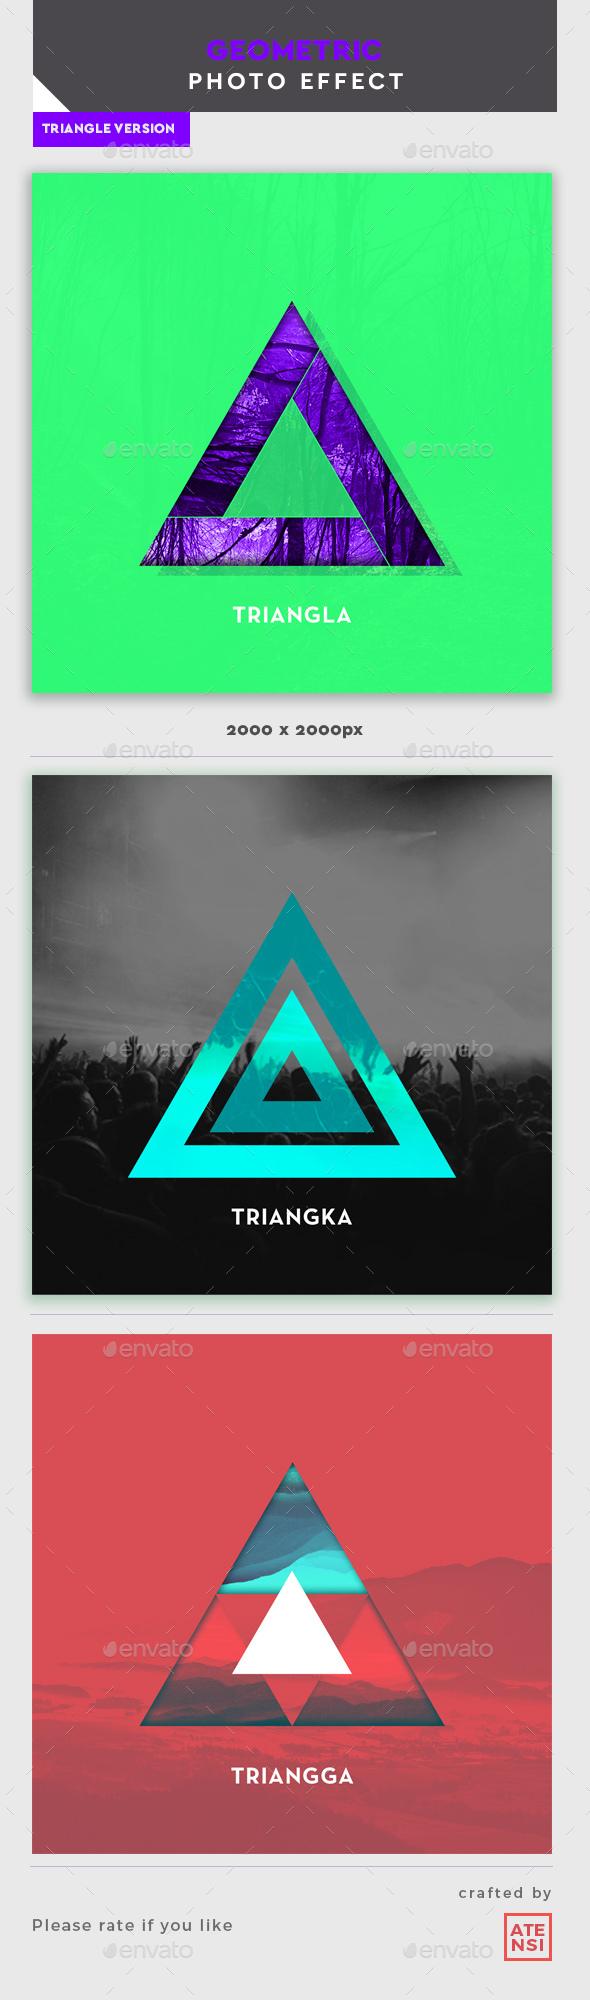 Triangle Geometric Template - Artistic Photo Templates